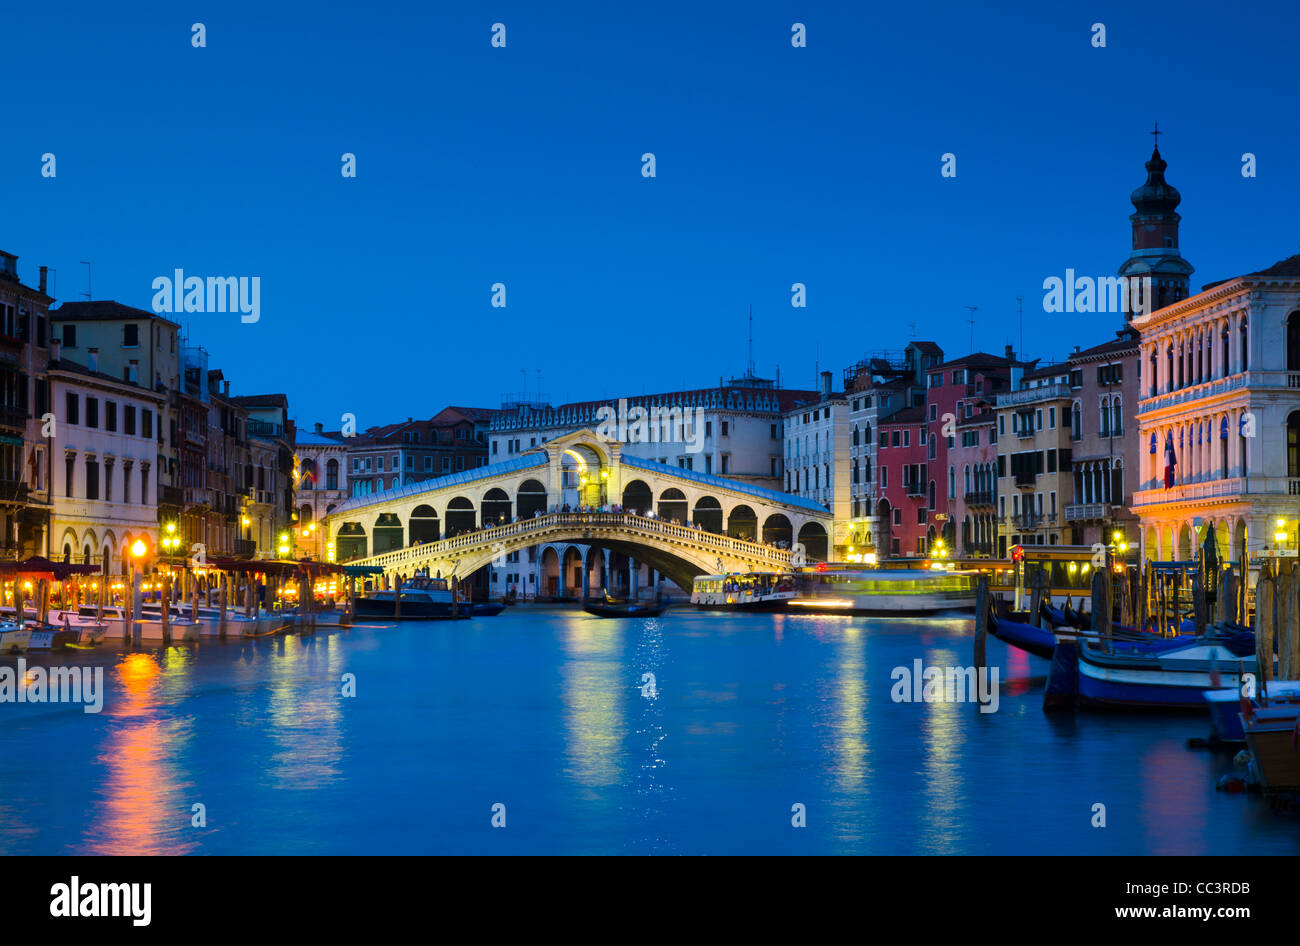 Italy, Veneto, Venice, Rialto Bridge over Grand Canal - Stock Image